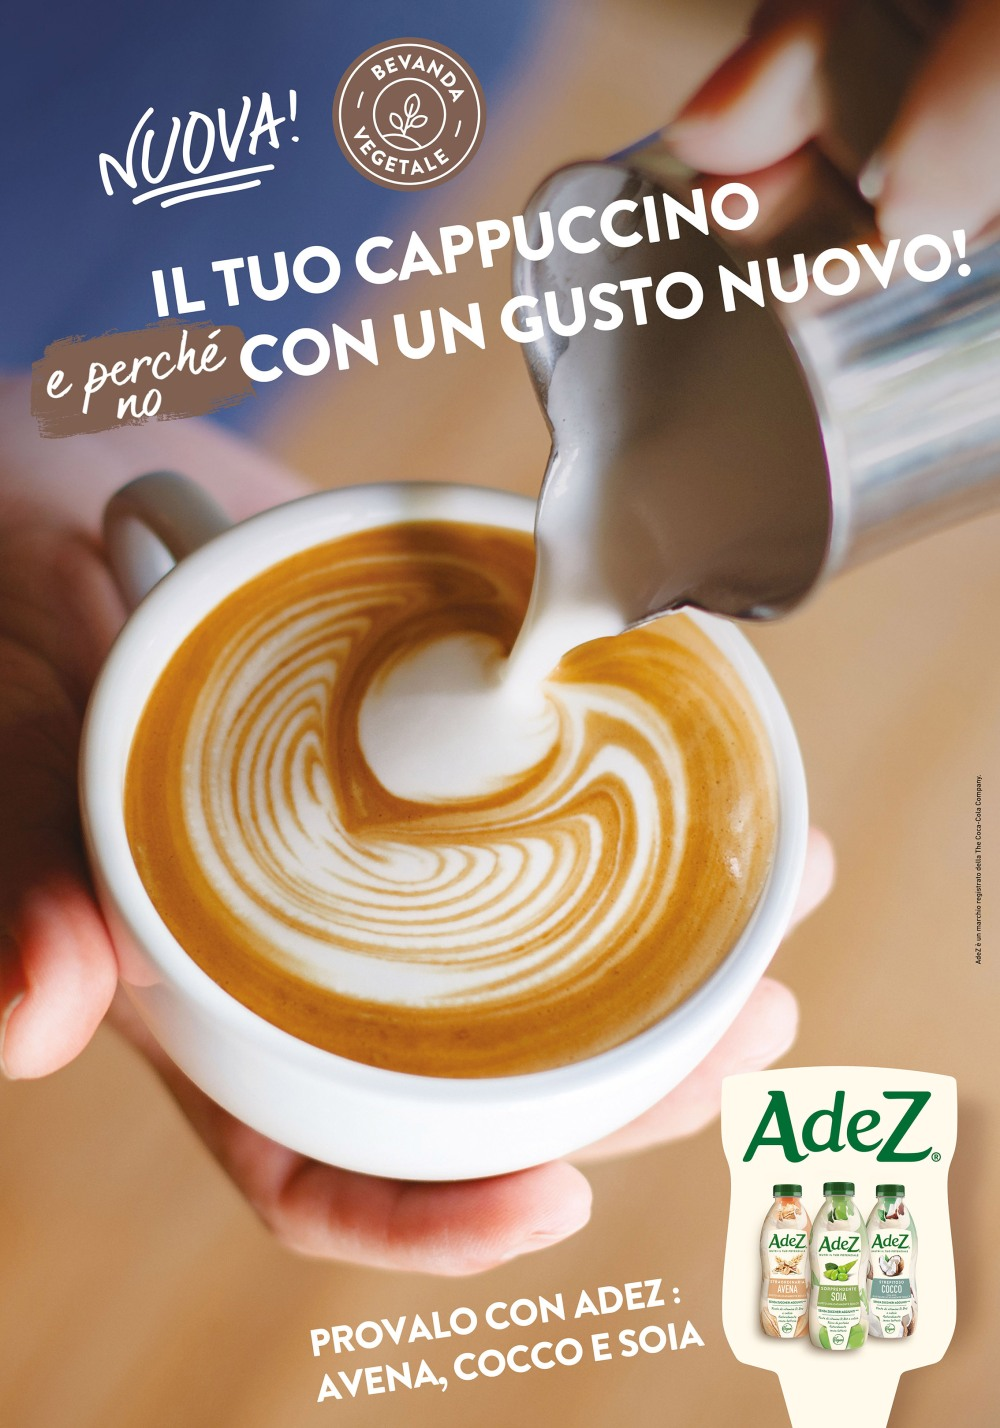 Adez_Locandina_Cappuccino_35x50cm